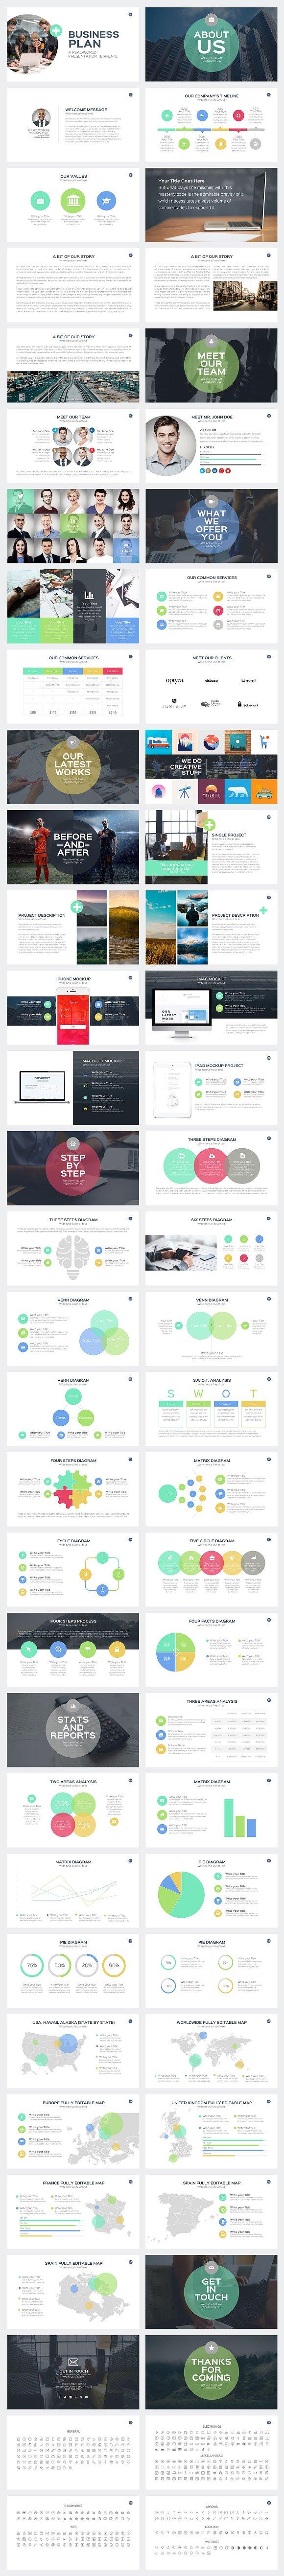 business plan powerpoint template presentation templates creative market